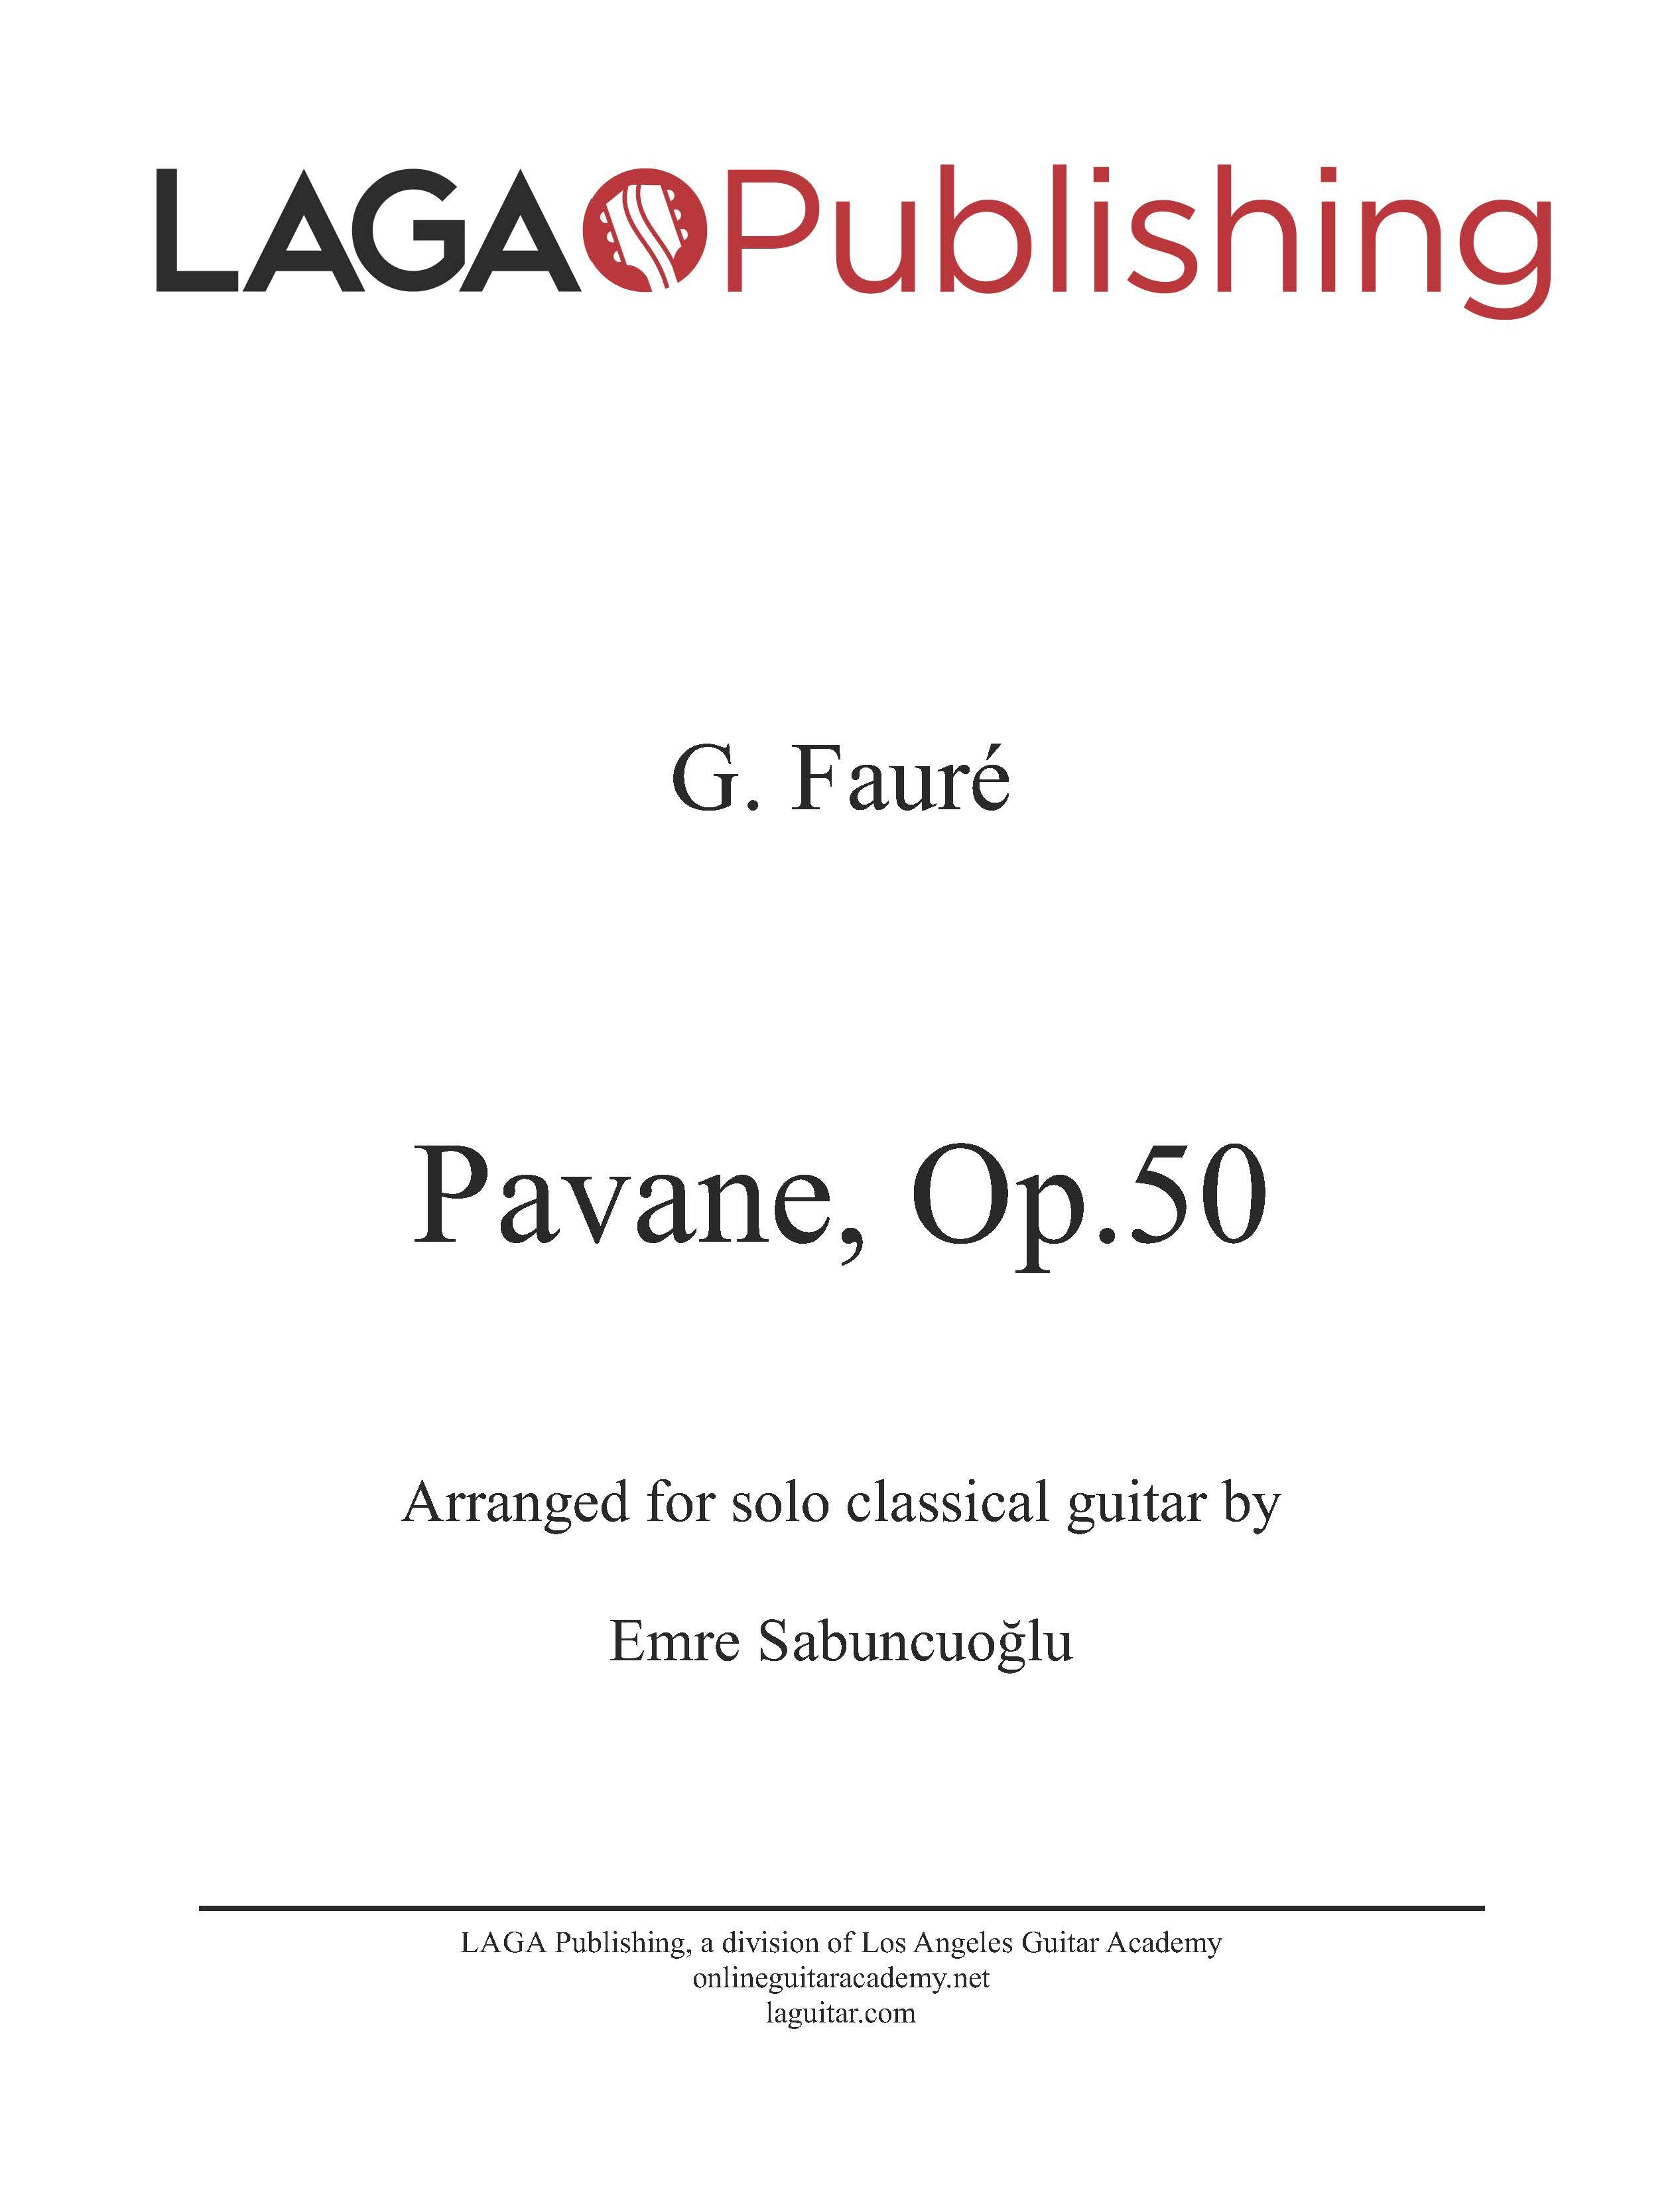 LAGA-Publishing-Faure-Pavane-Score-and-Tab